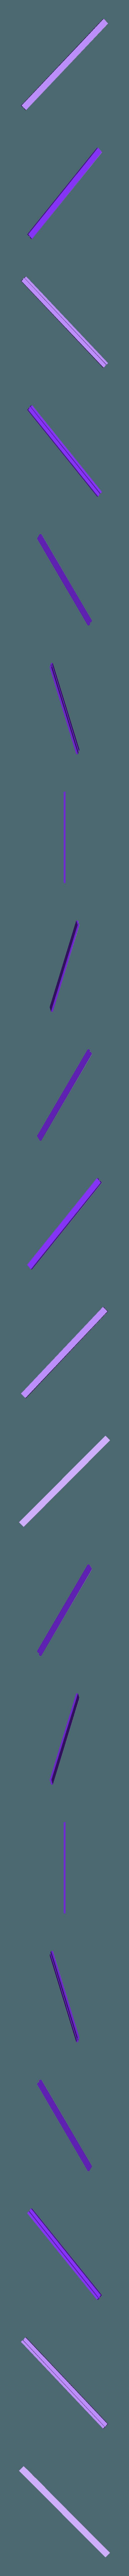 long_leg_x3.stl Download free STL file Firestorm Quantum Splicer • 3D printable design, poblocki1982